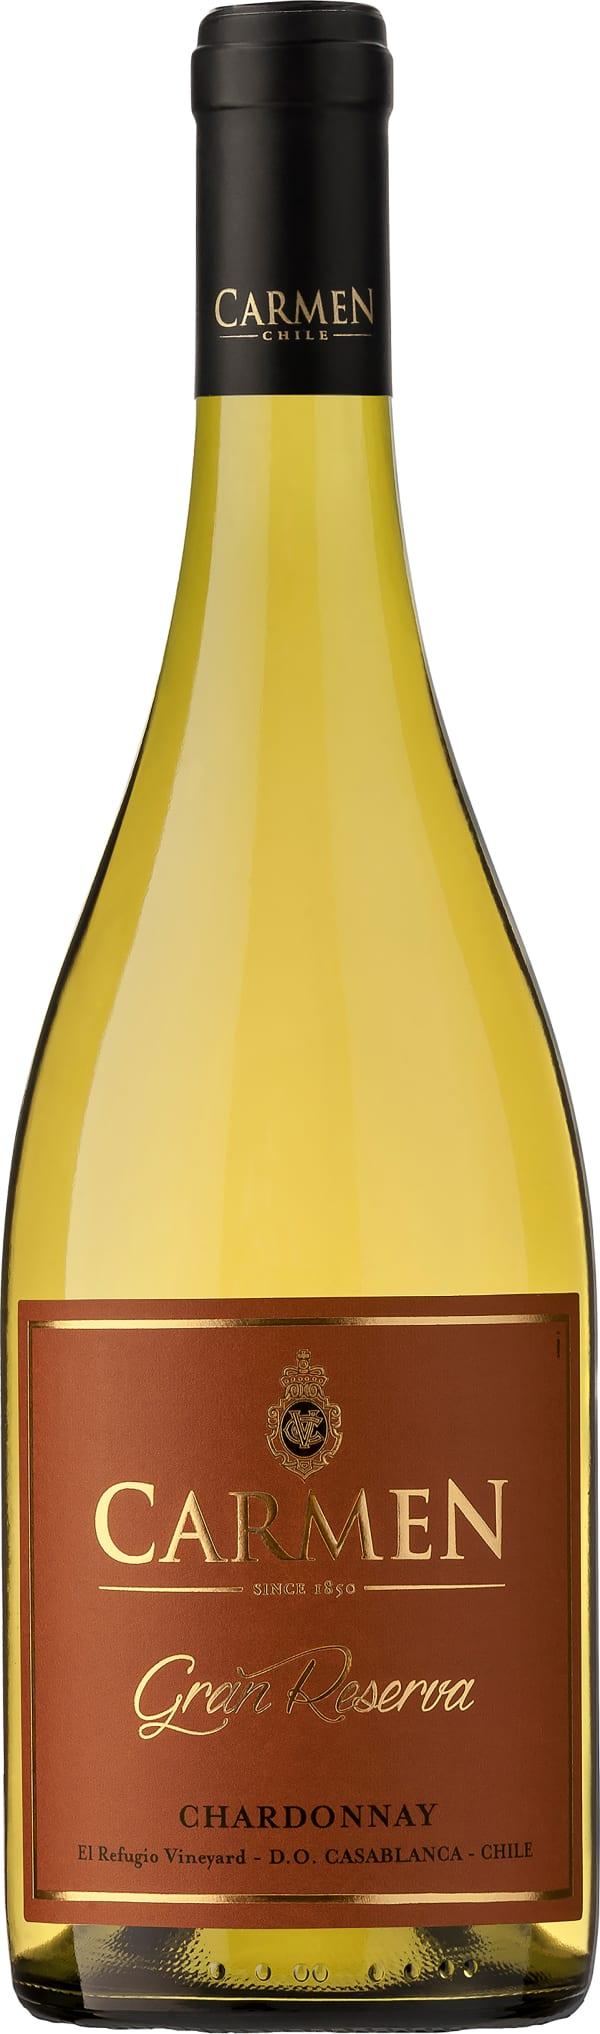 Carmen Gran Reserva Chardonnay 2017